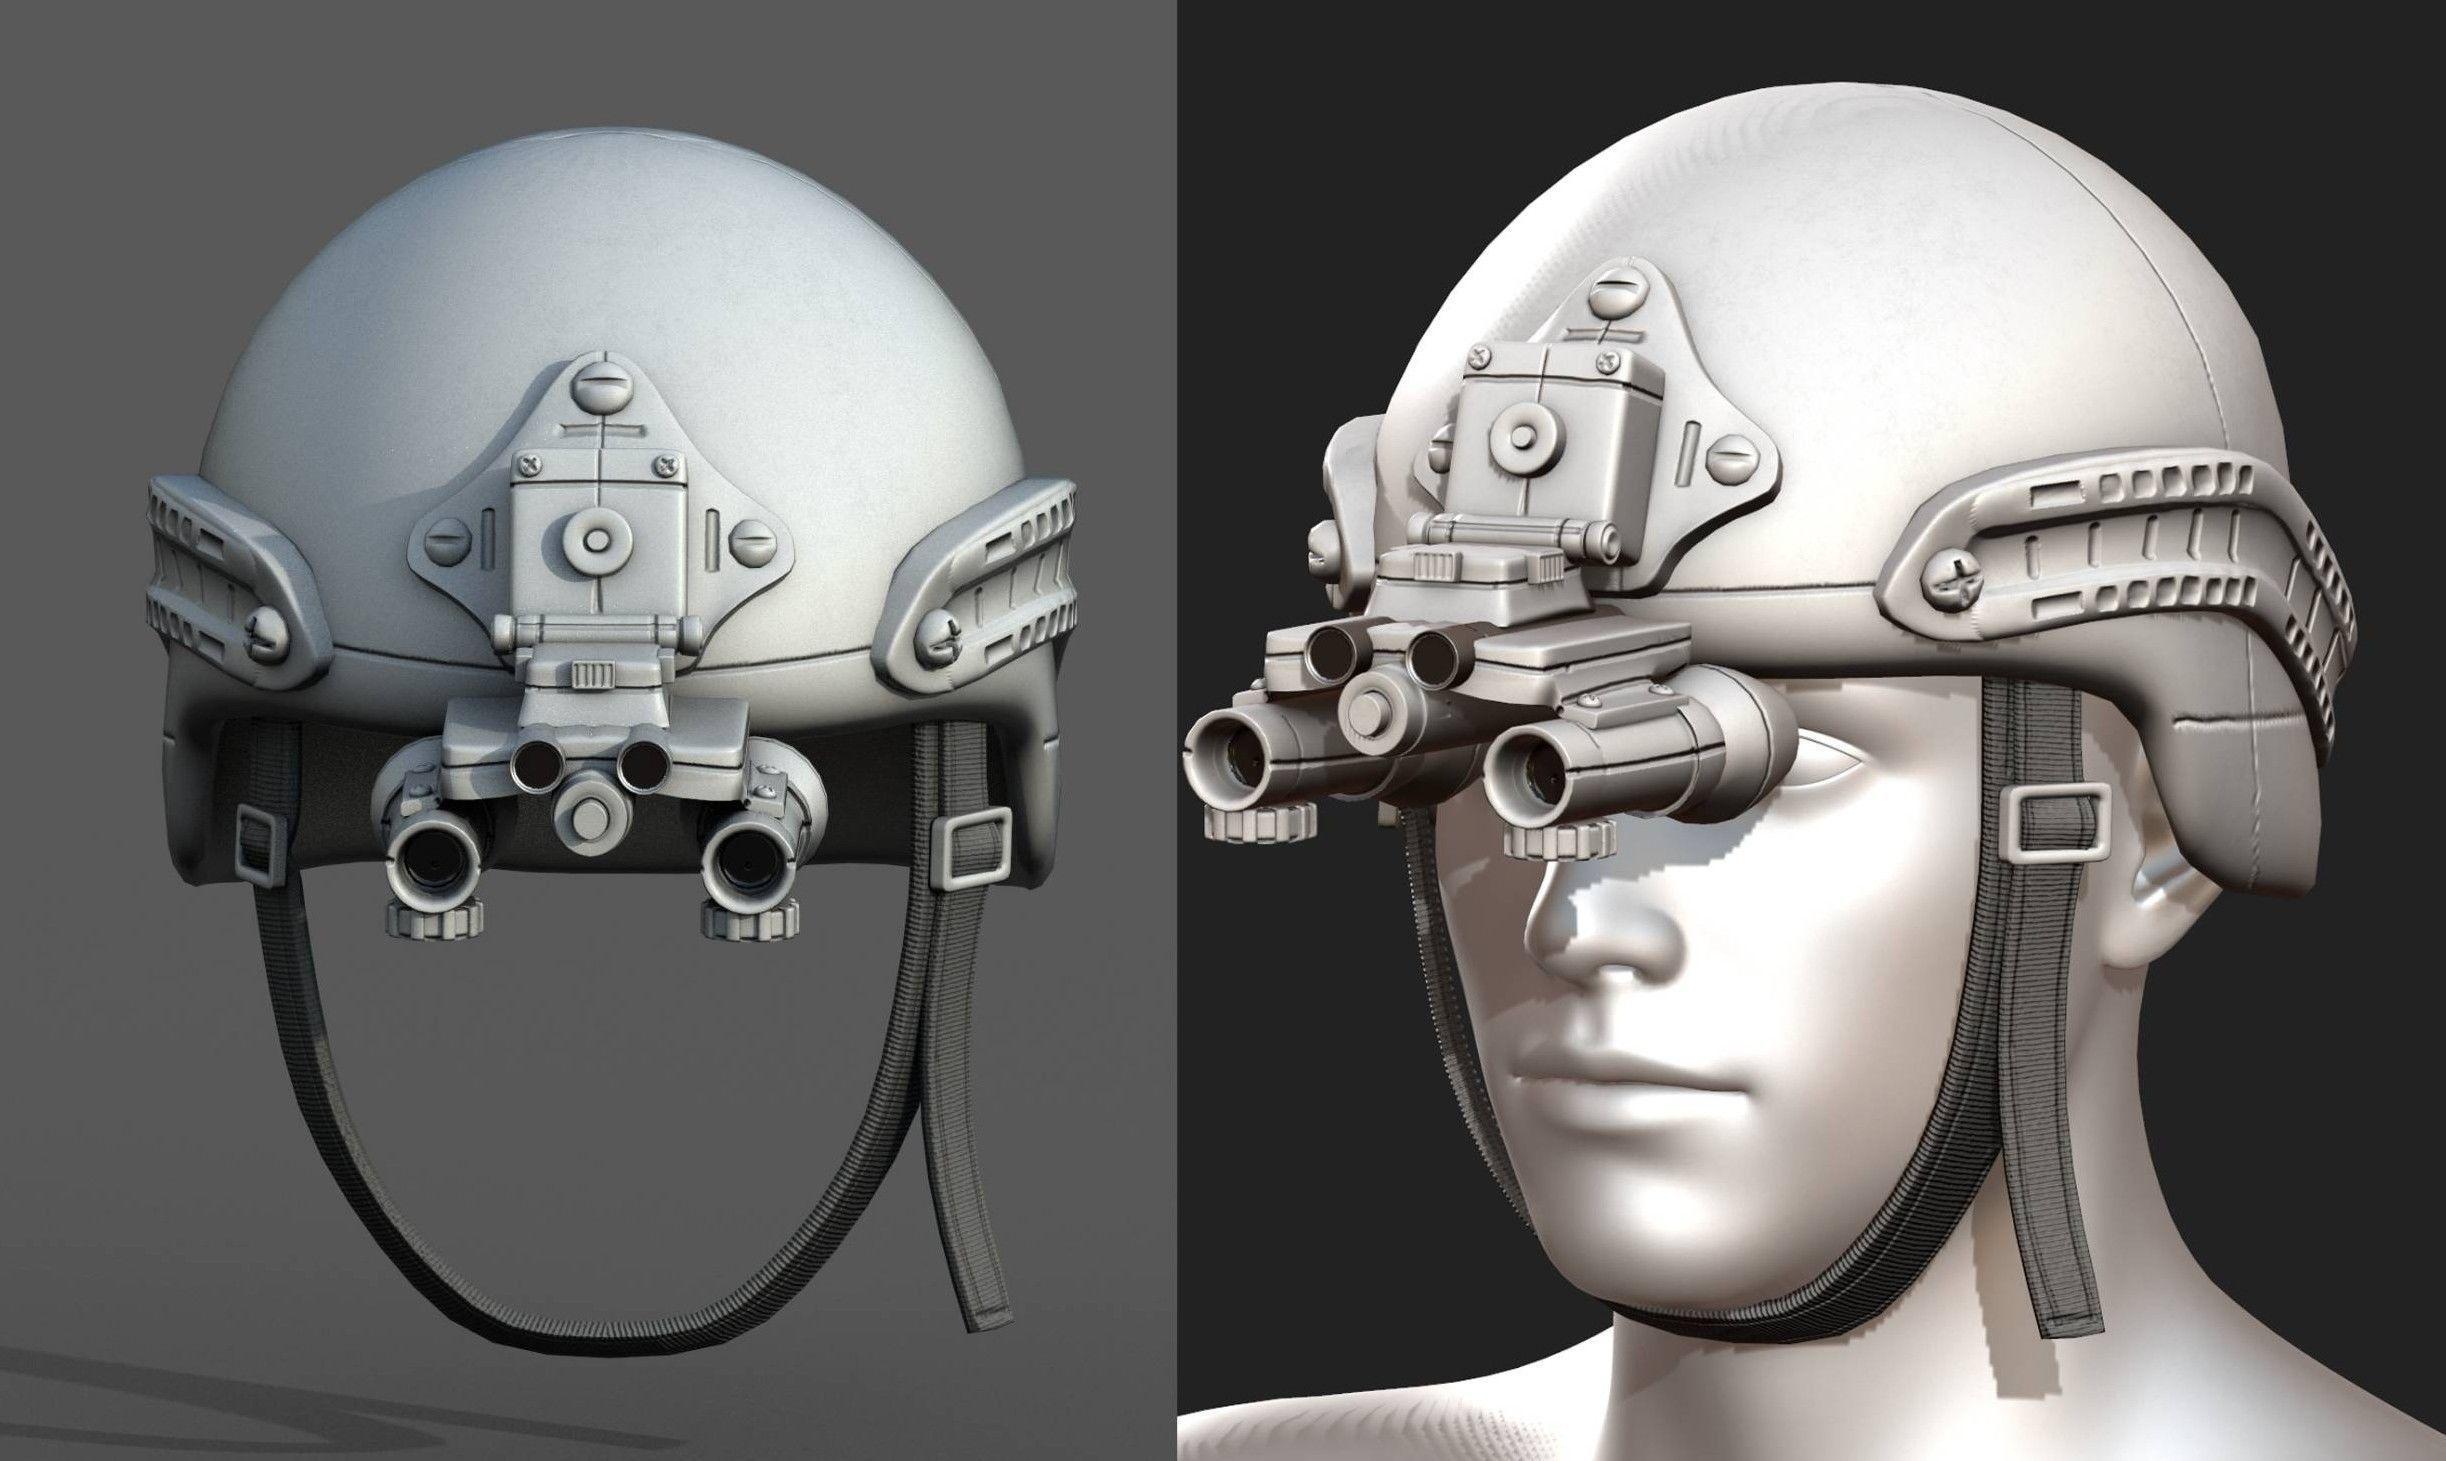 Helmet scifi fantasy futuristic technology fantasy